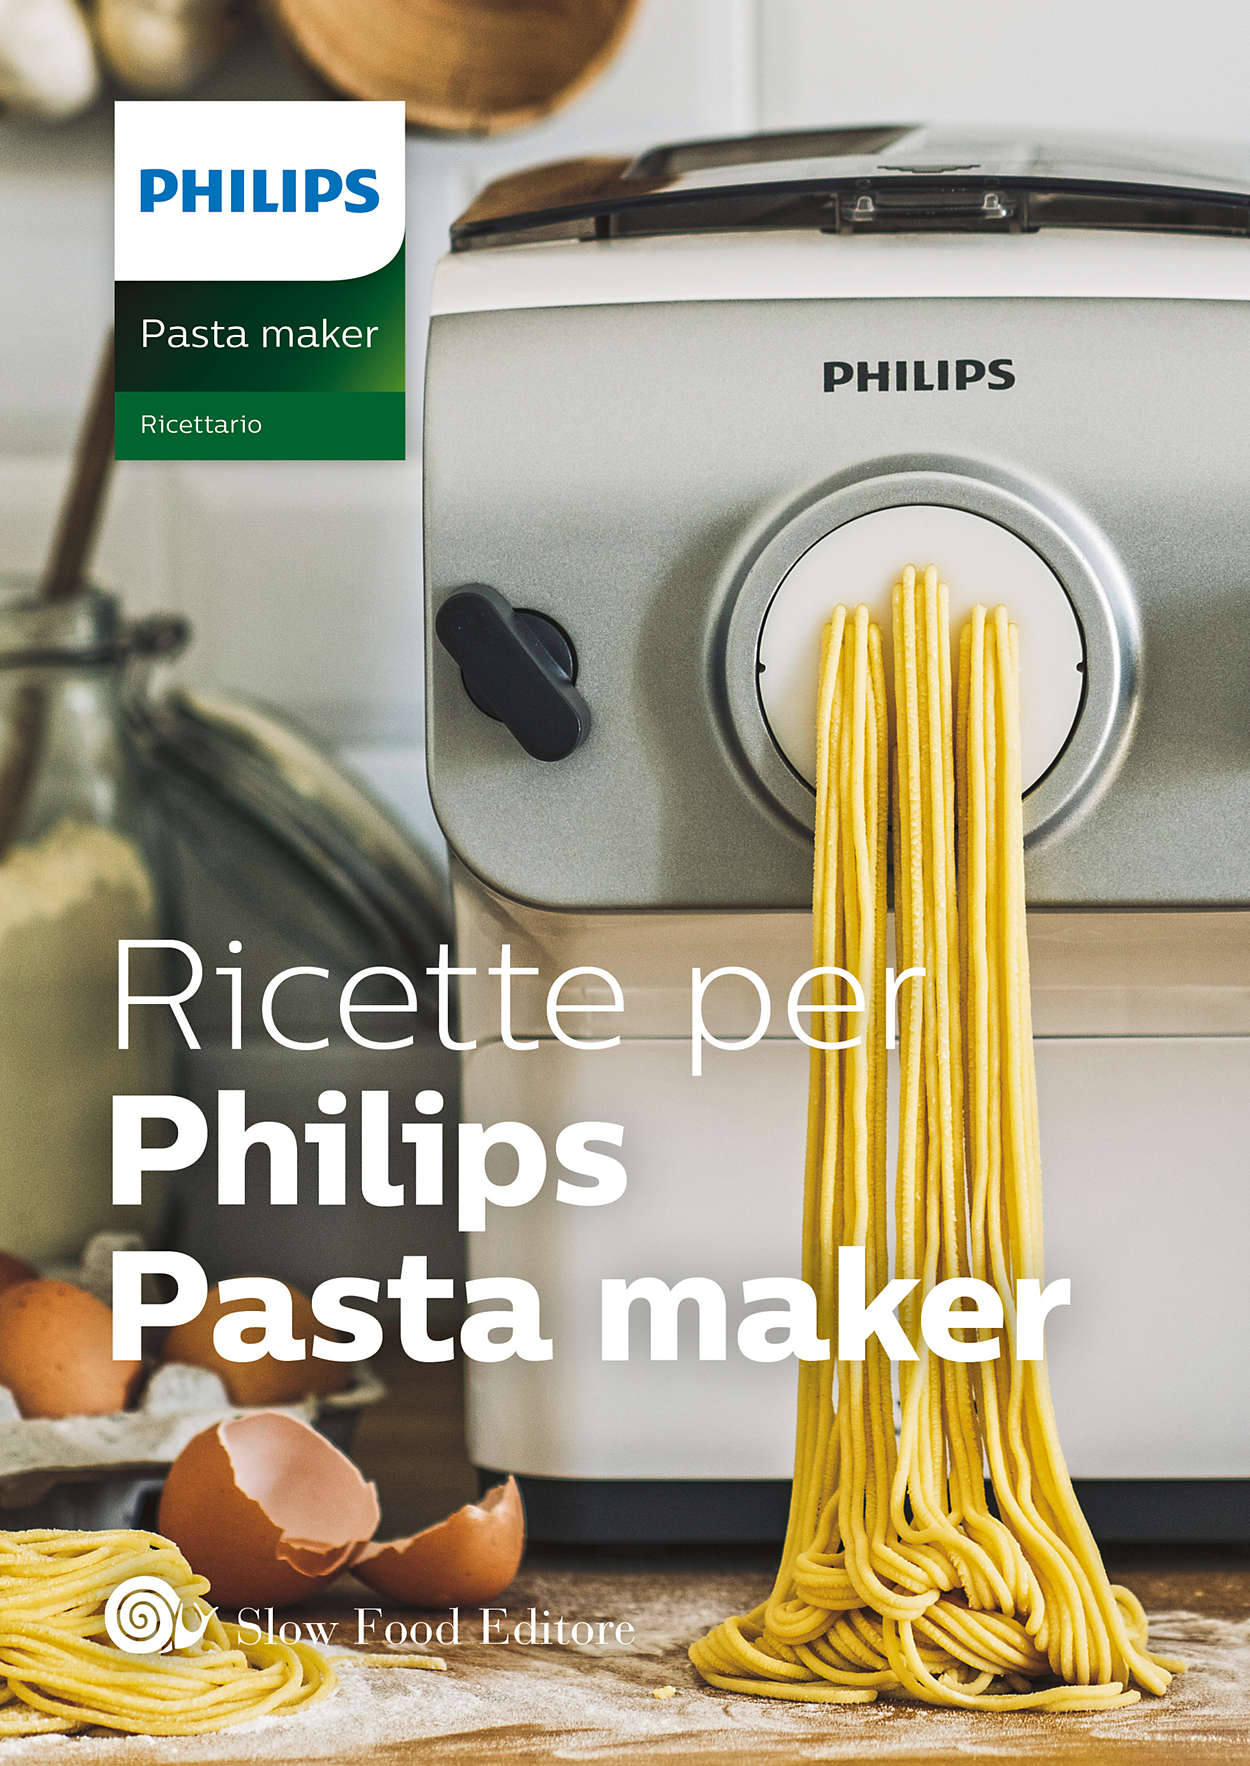 Ricette per Philips Pasta maker